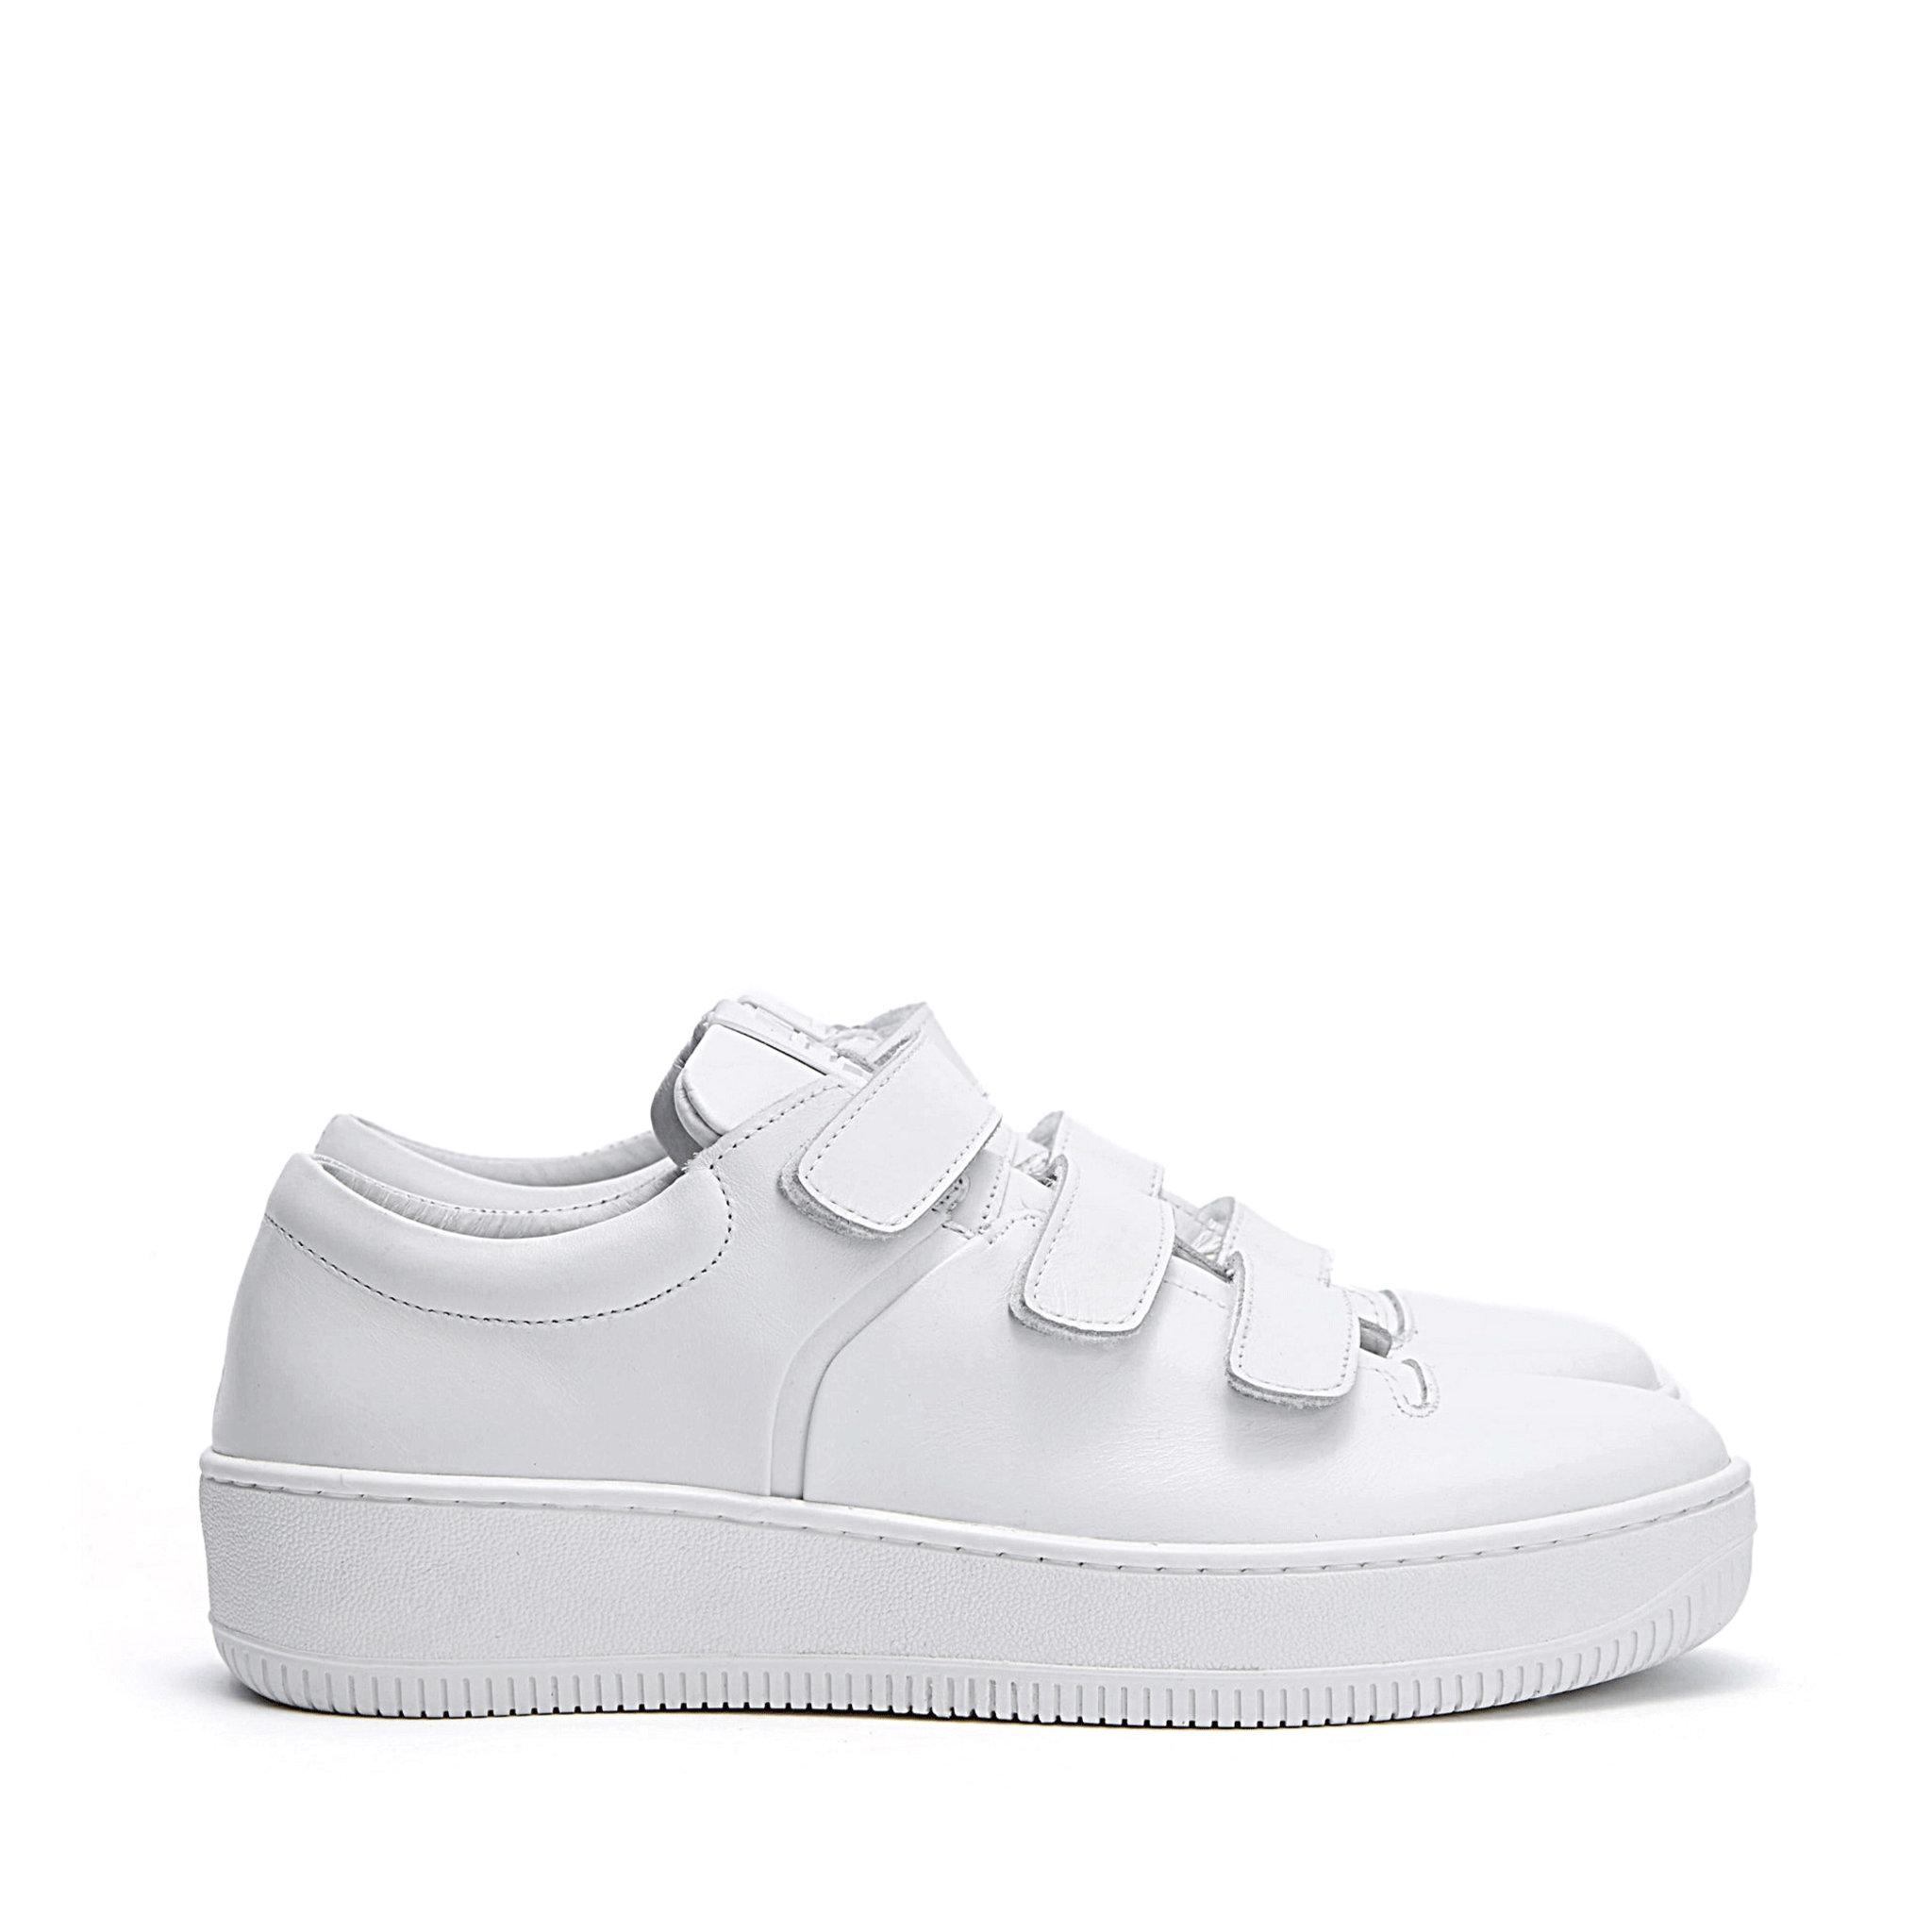 a576d92f Cloud Fat Velcro sneaker - Sneakers - Köp online på åhlens.se!